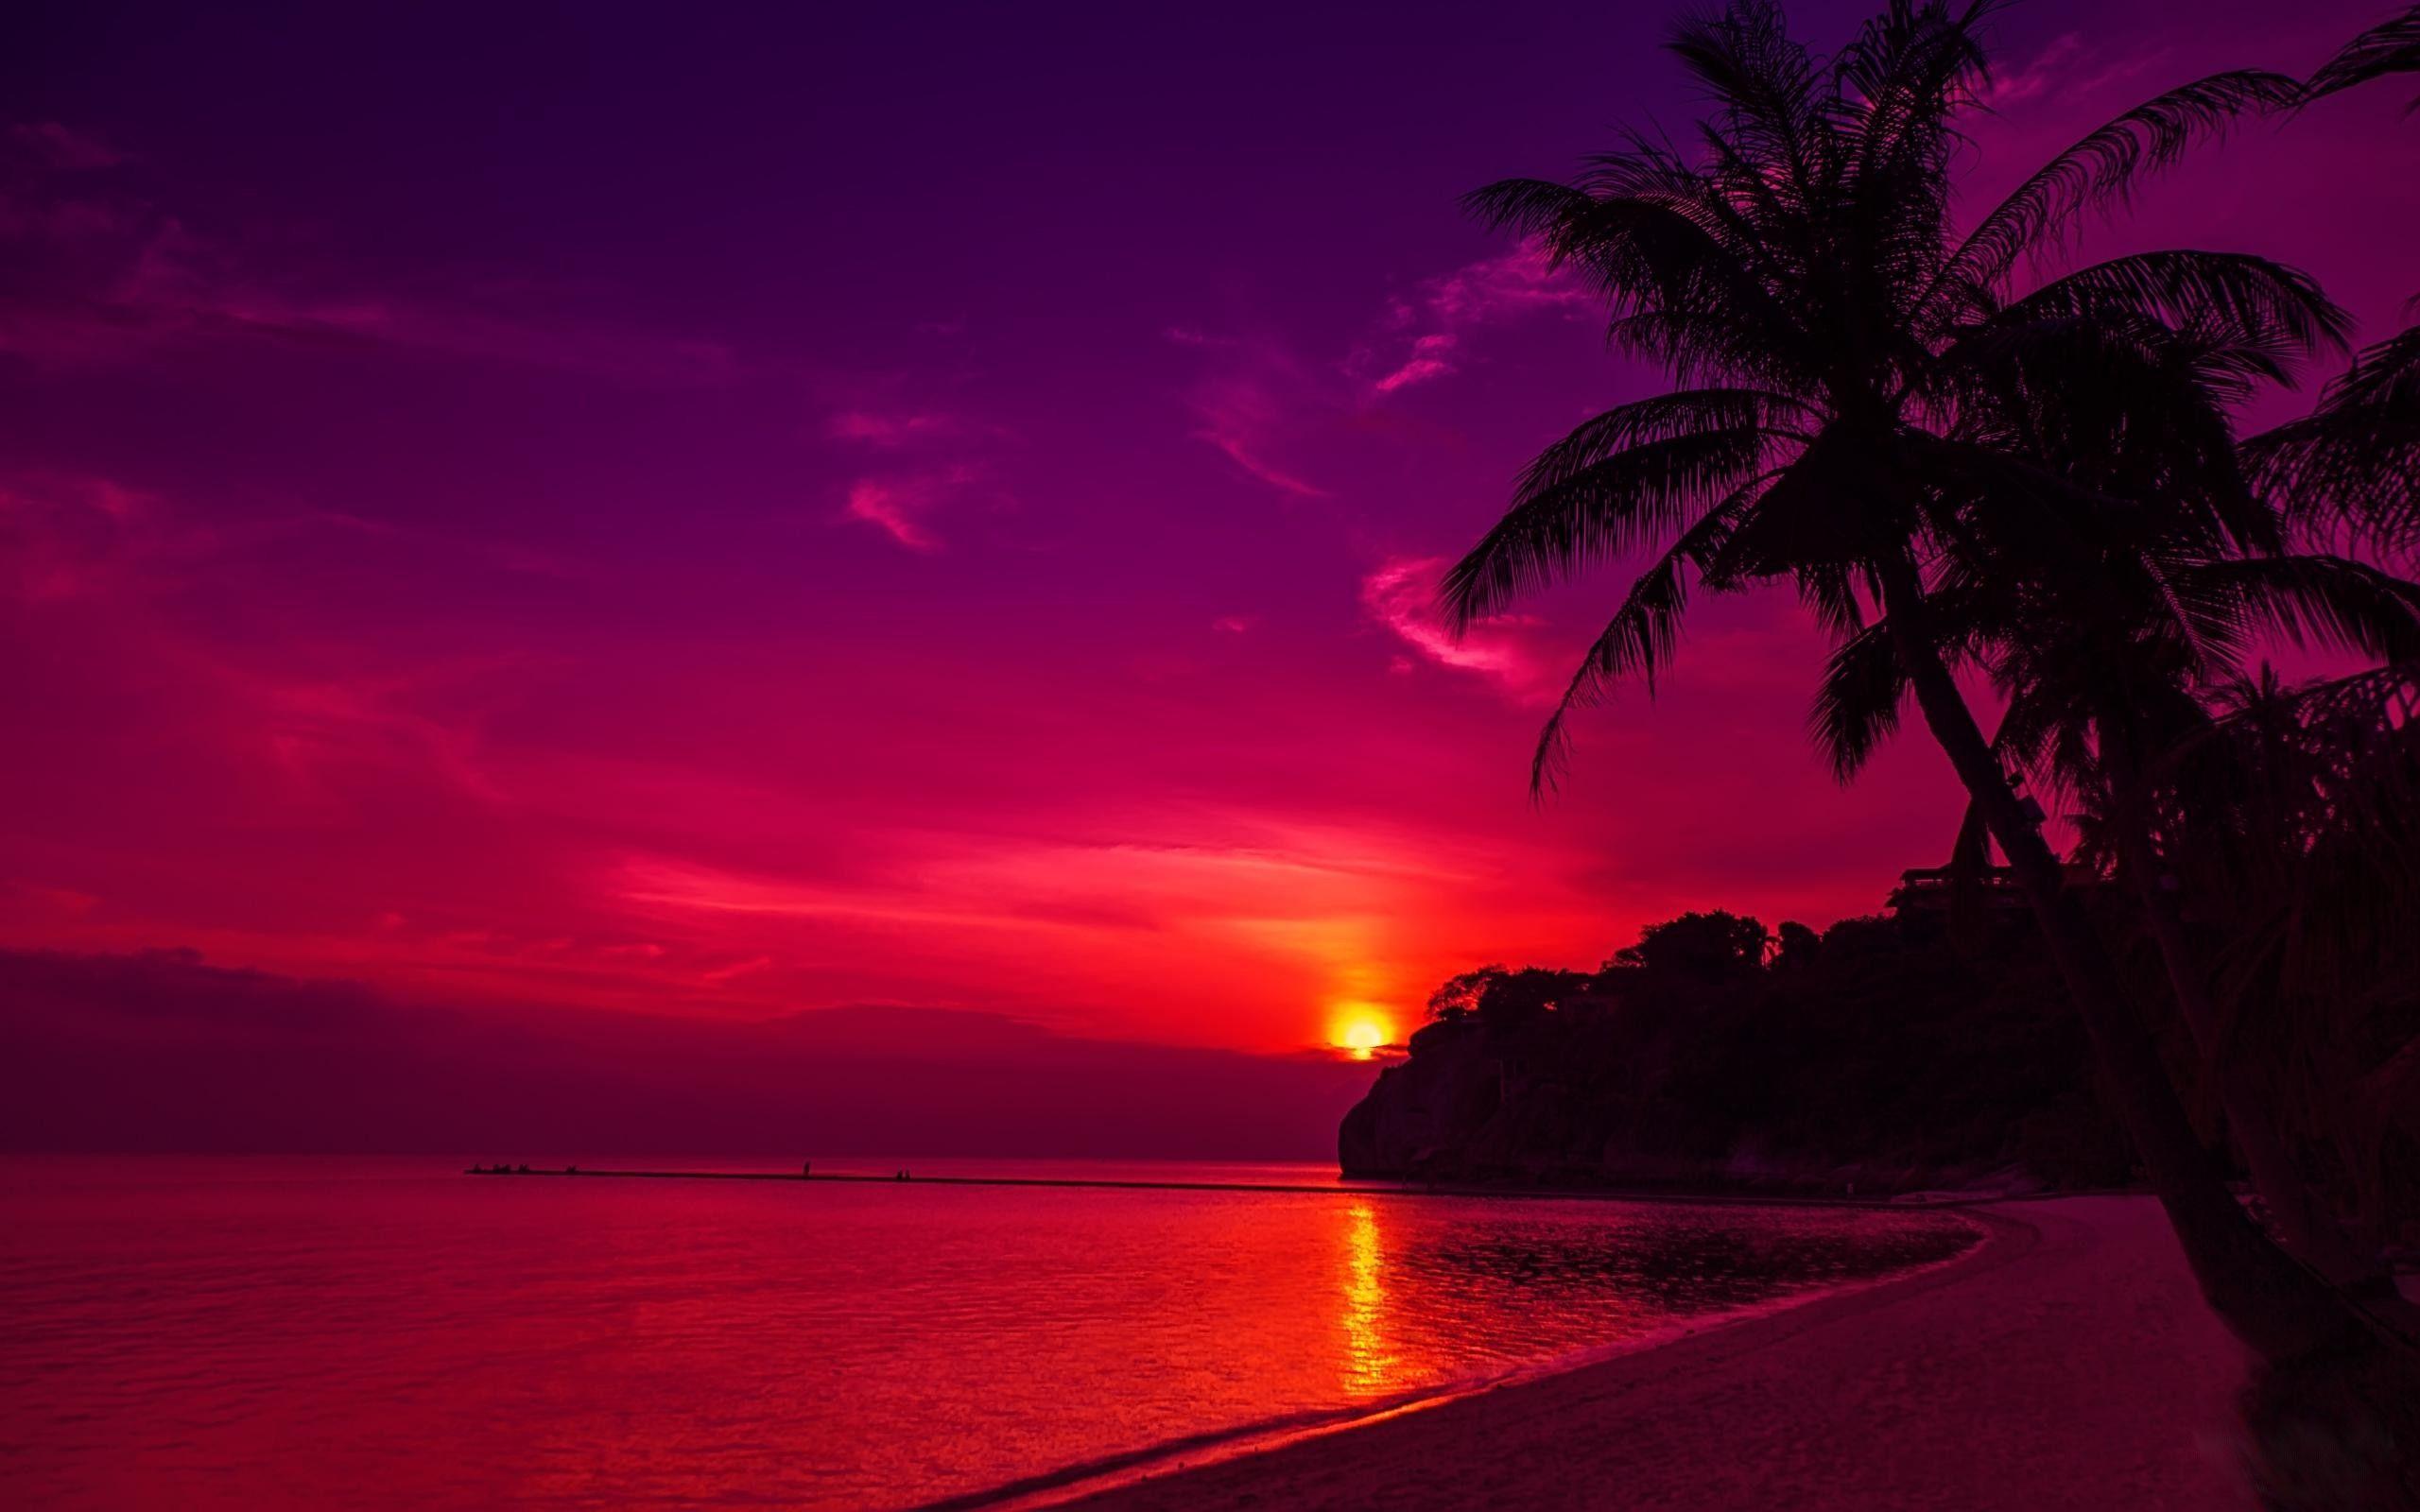 Sky Night Thailand Beach Beach Sunset Wallpaper Sunset Wallpaper Beach Wallpaper